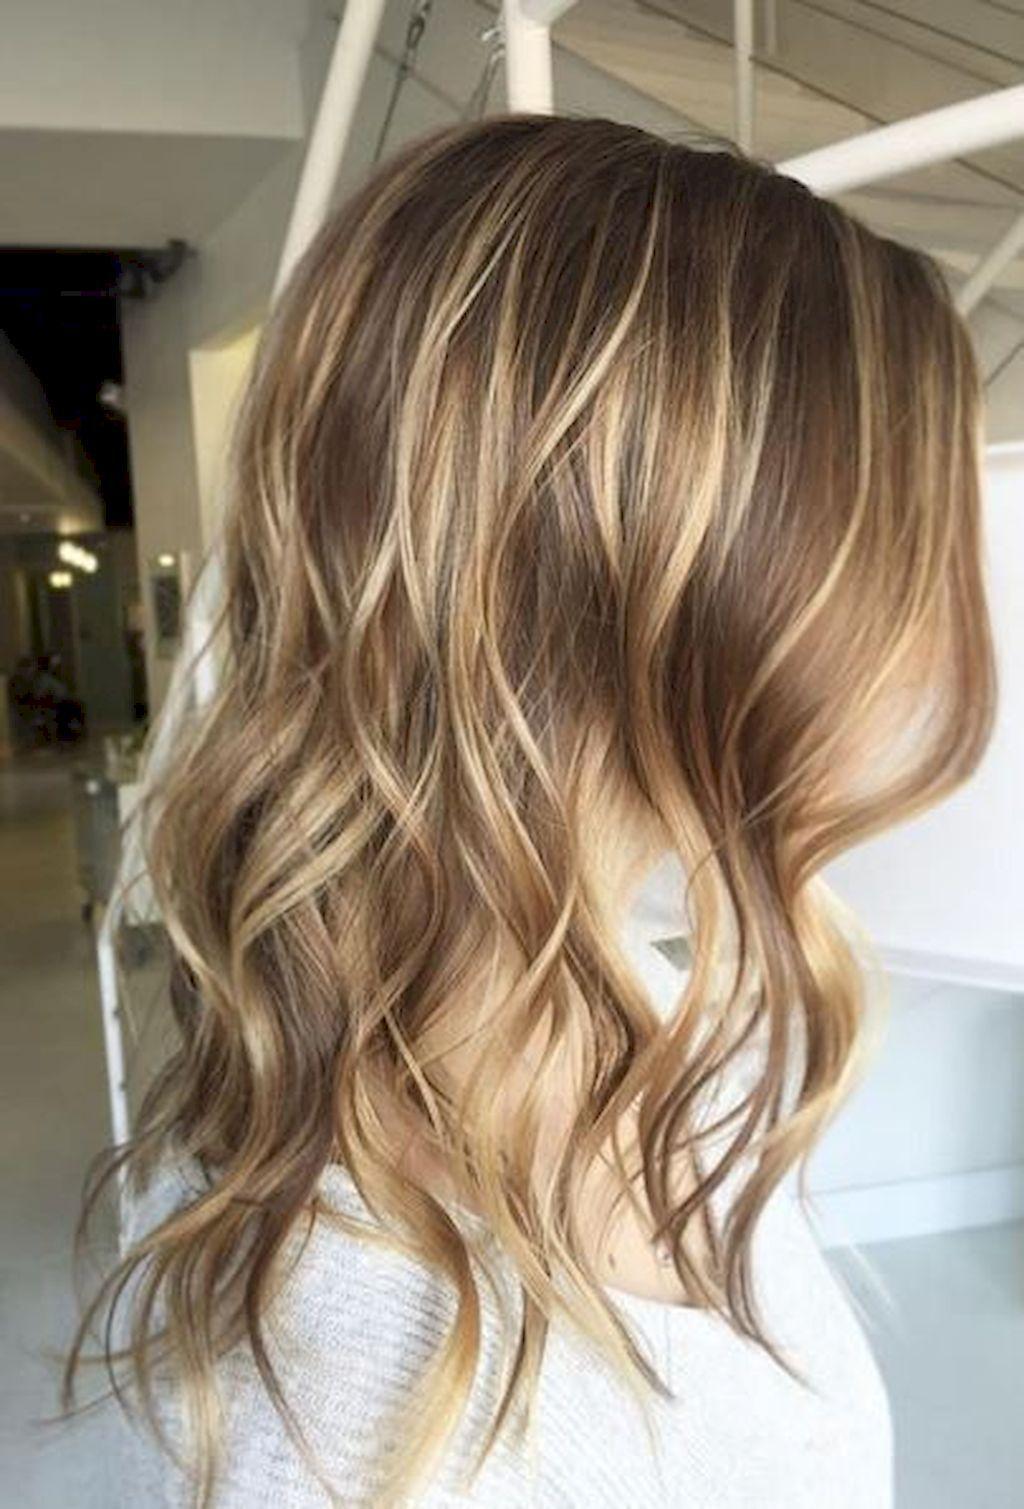 cute ideas to spice up light brown hair ideas hairstyle hair